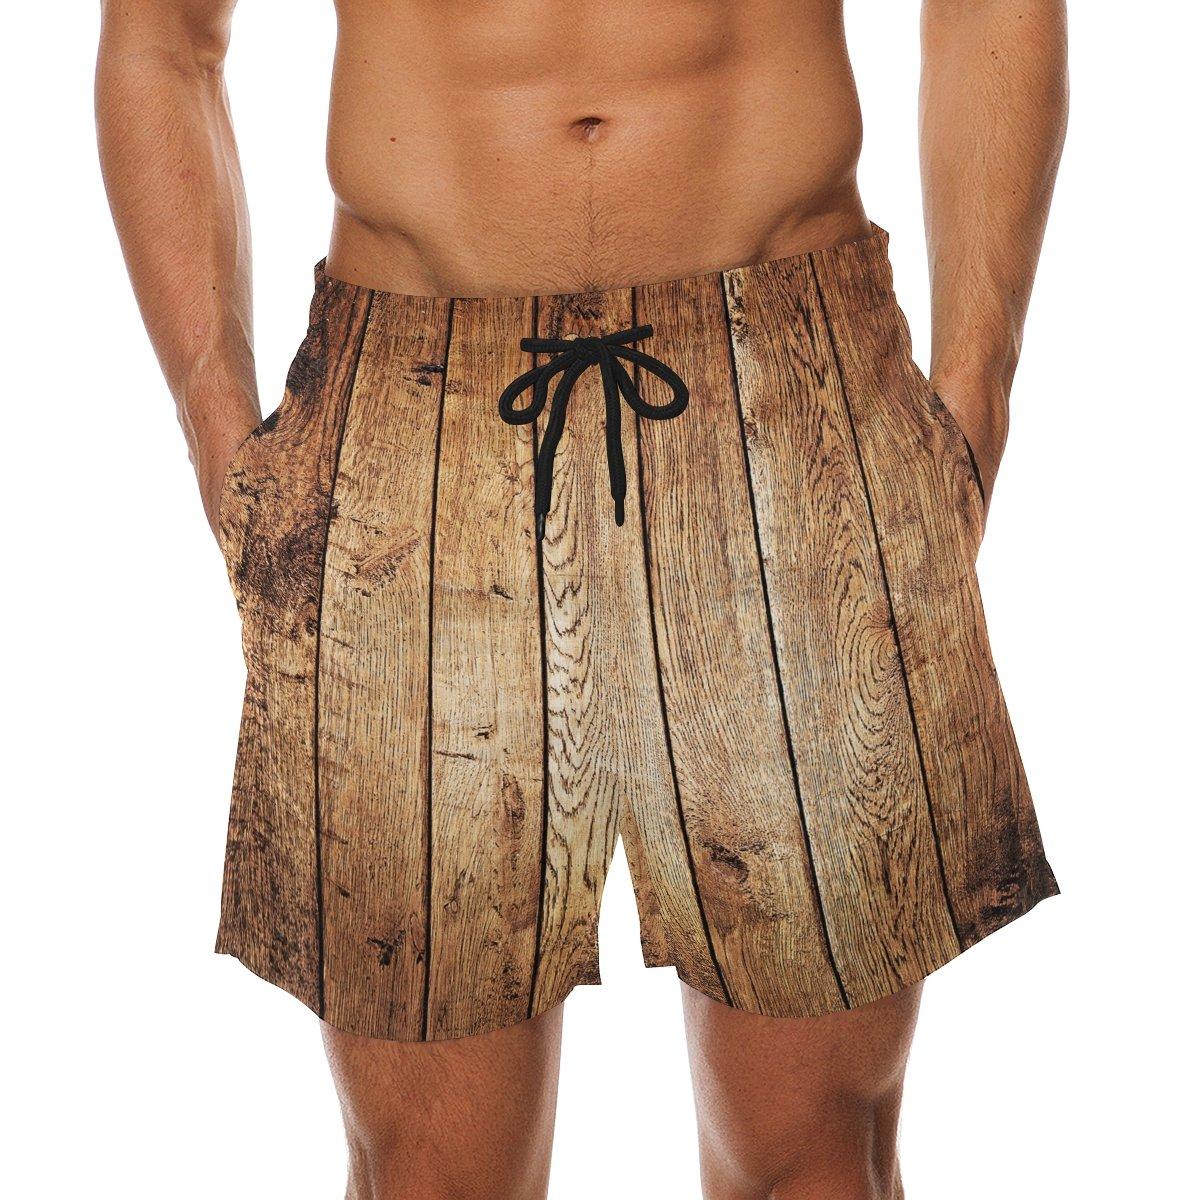 KEAKIA Mens Wood Beach Board Shorts Quick Dry Swim Trunk